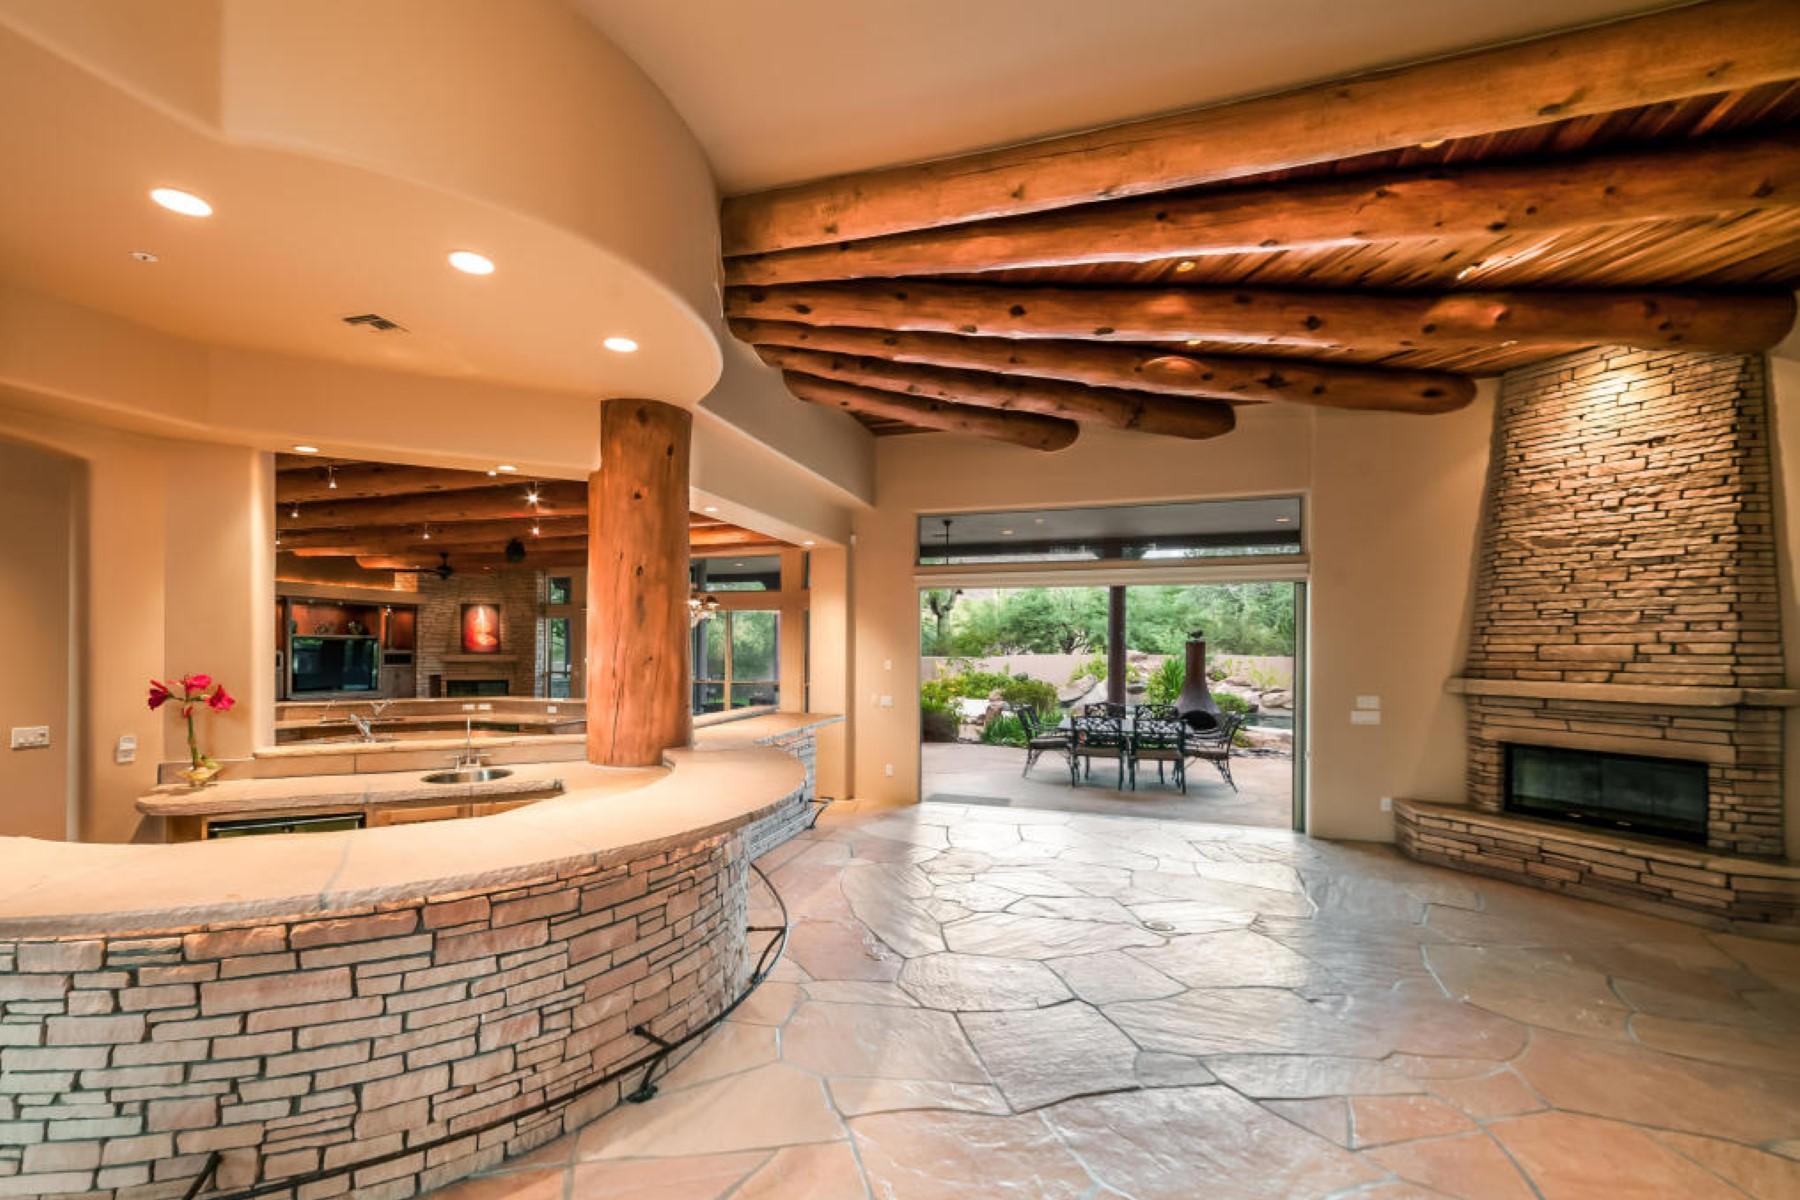 Casa para uma família para Venda às Coveted North Scottsdale gated community of Desert Skyline Estates 25275 N 92nd ST Scottsdale, Arizona 85255 Estados Unidos